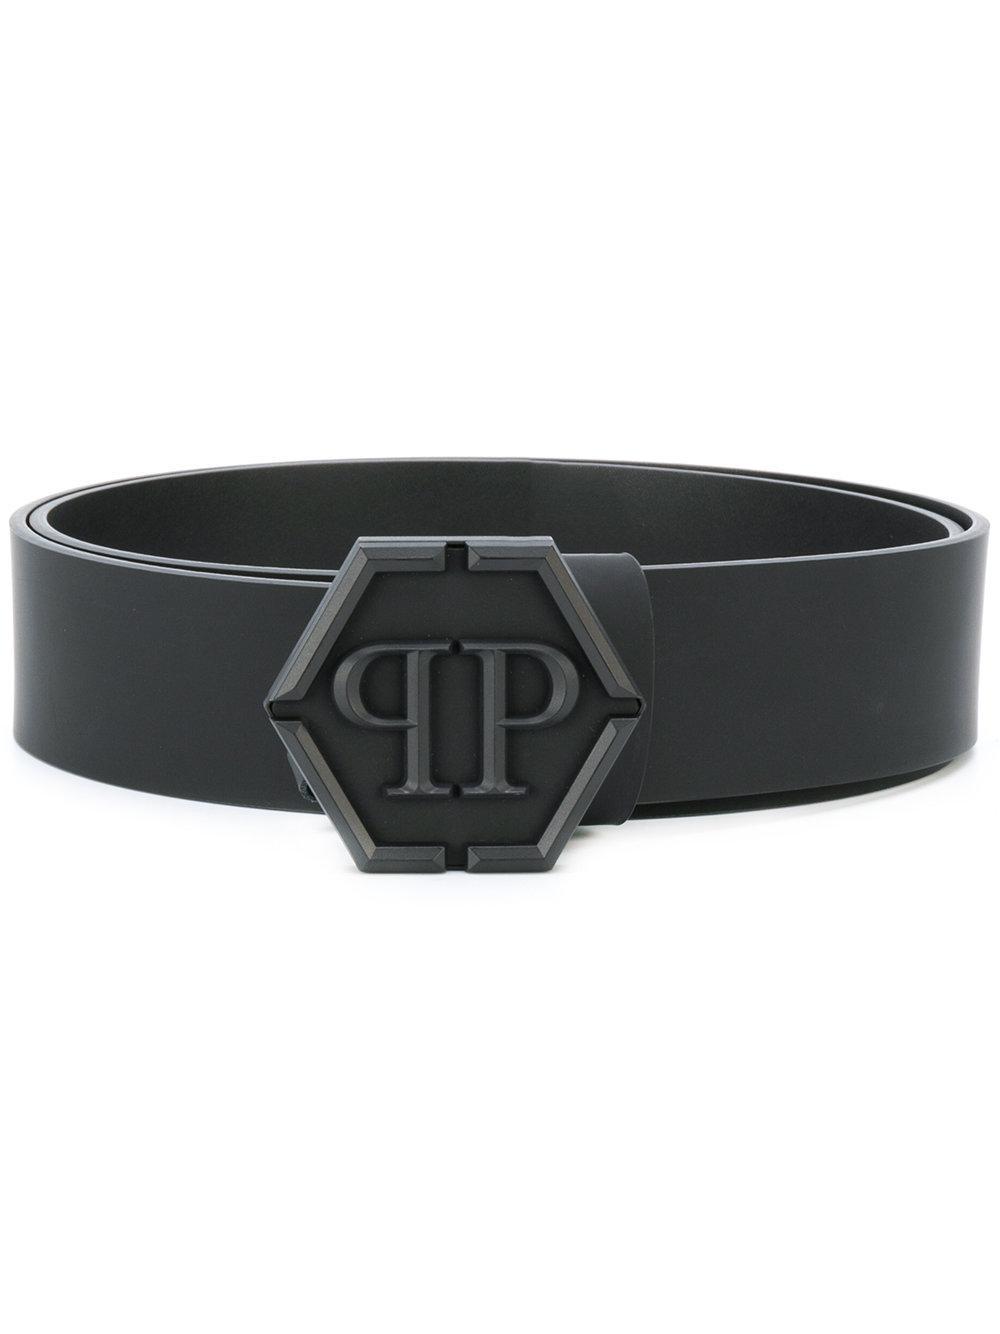 philipp plein hexagon buckle belt in black for men lyst. Black Bedroom Furniture Sets. Home Design Ideas